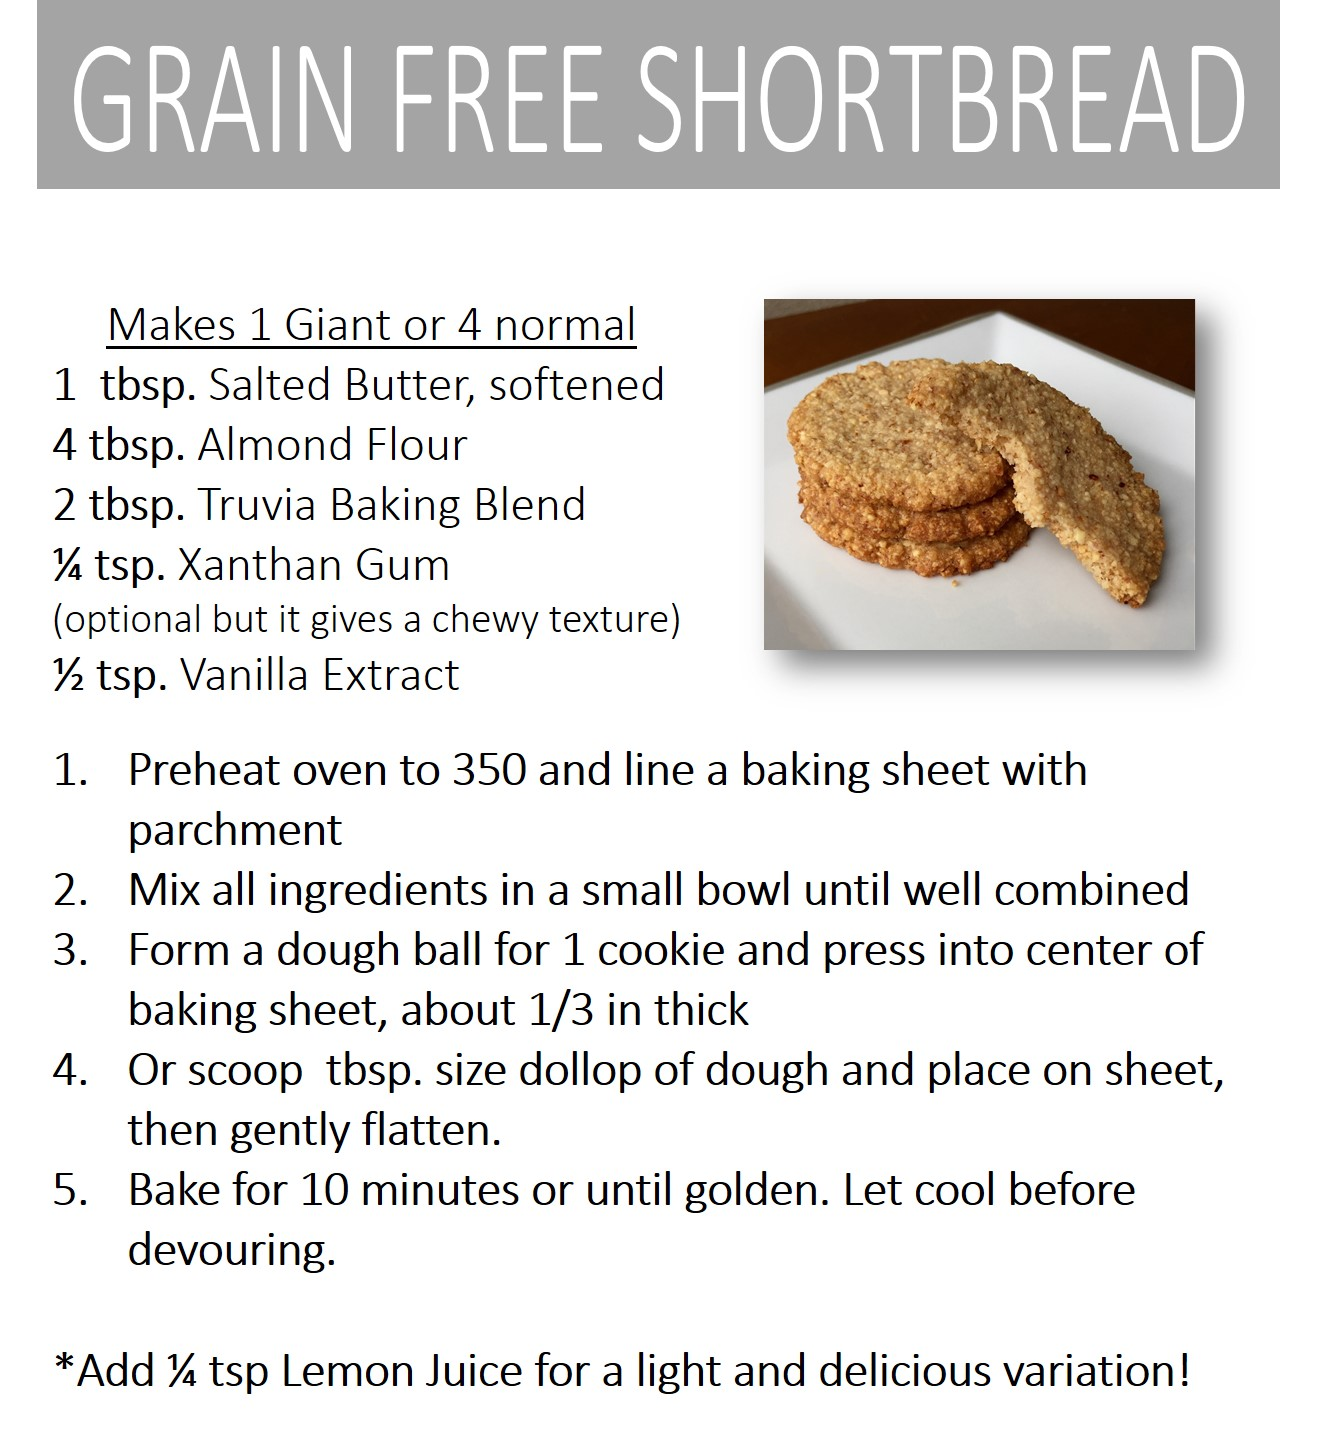 Grain Free Shortbread Recipe